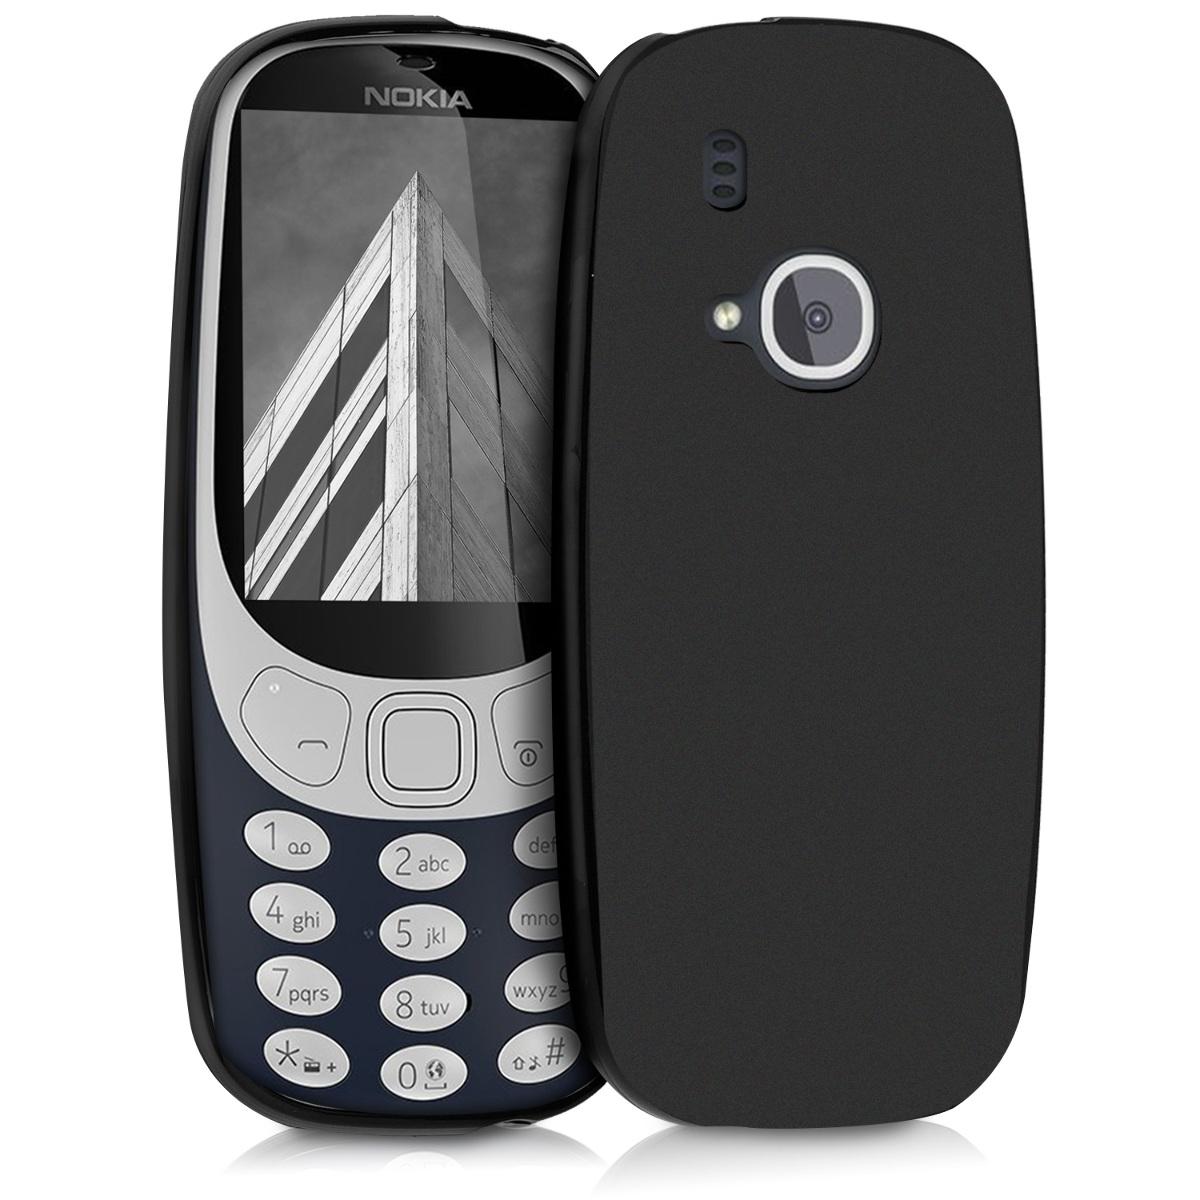 KW Θήκη Σιλικόνης Nokia 3310 (2017) - Black Matte (42884.47)